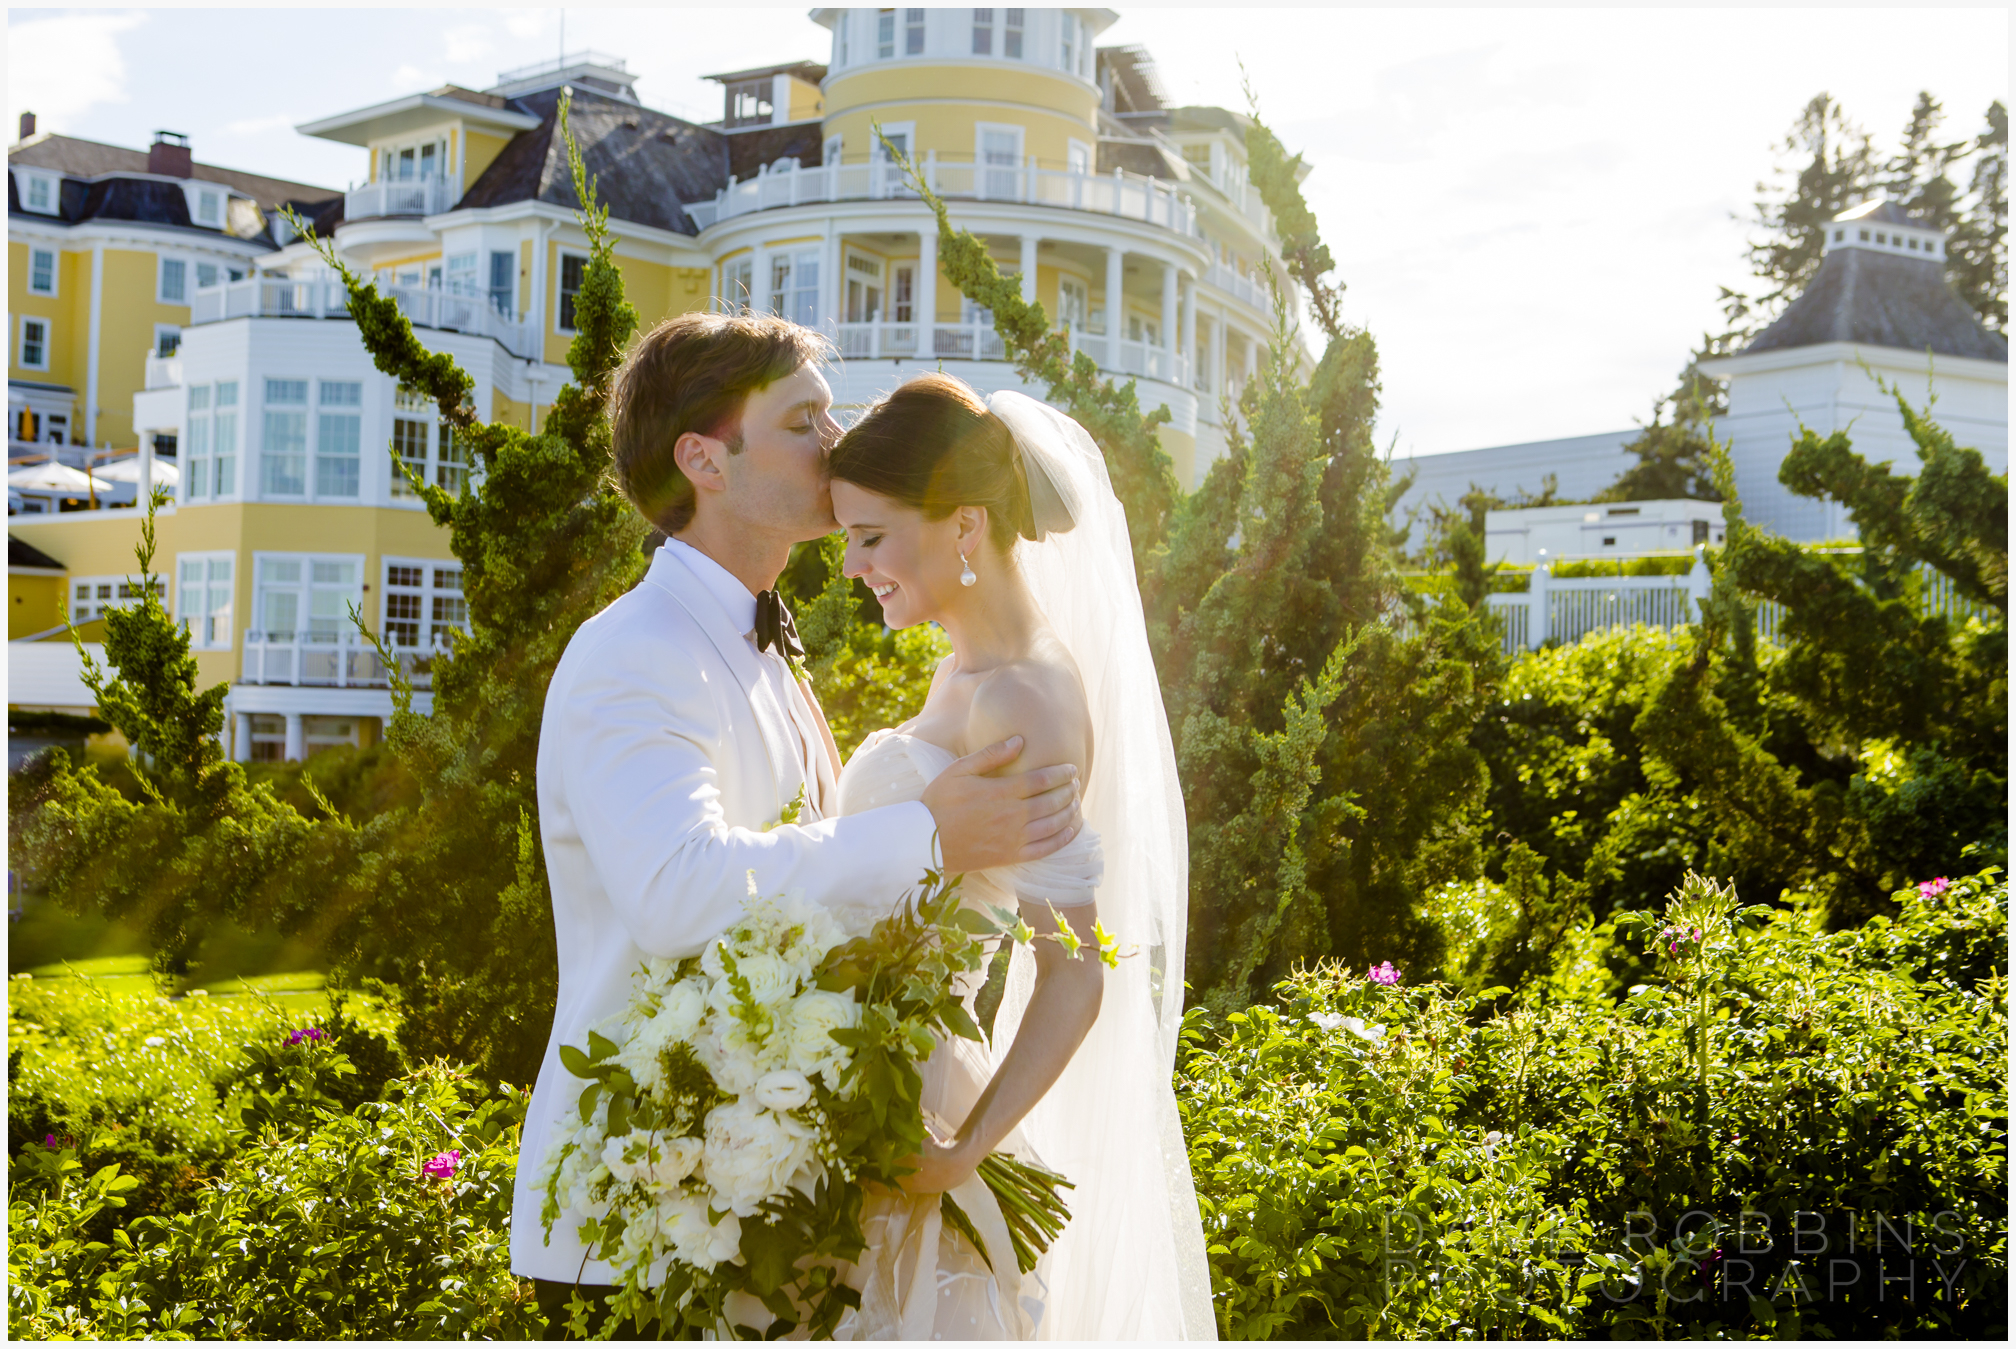 THE OCEAN HOUSE WEDDING 0050.JPG